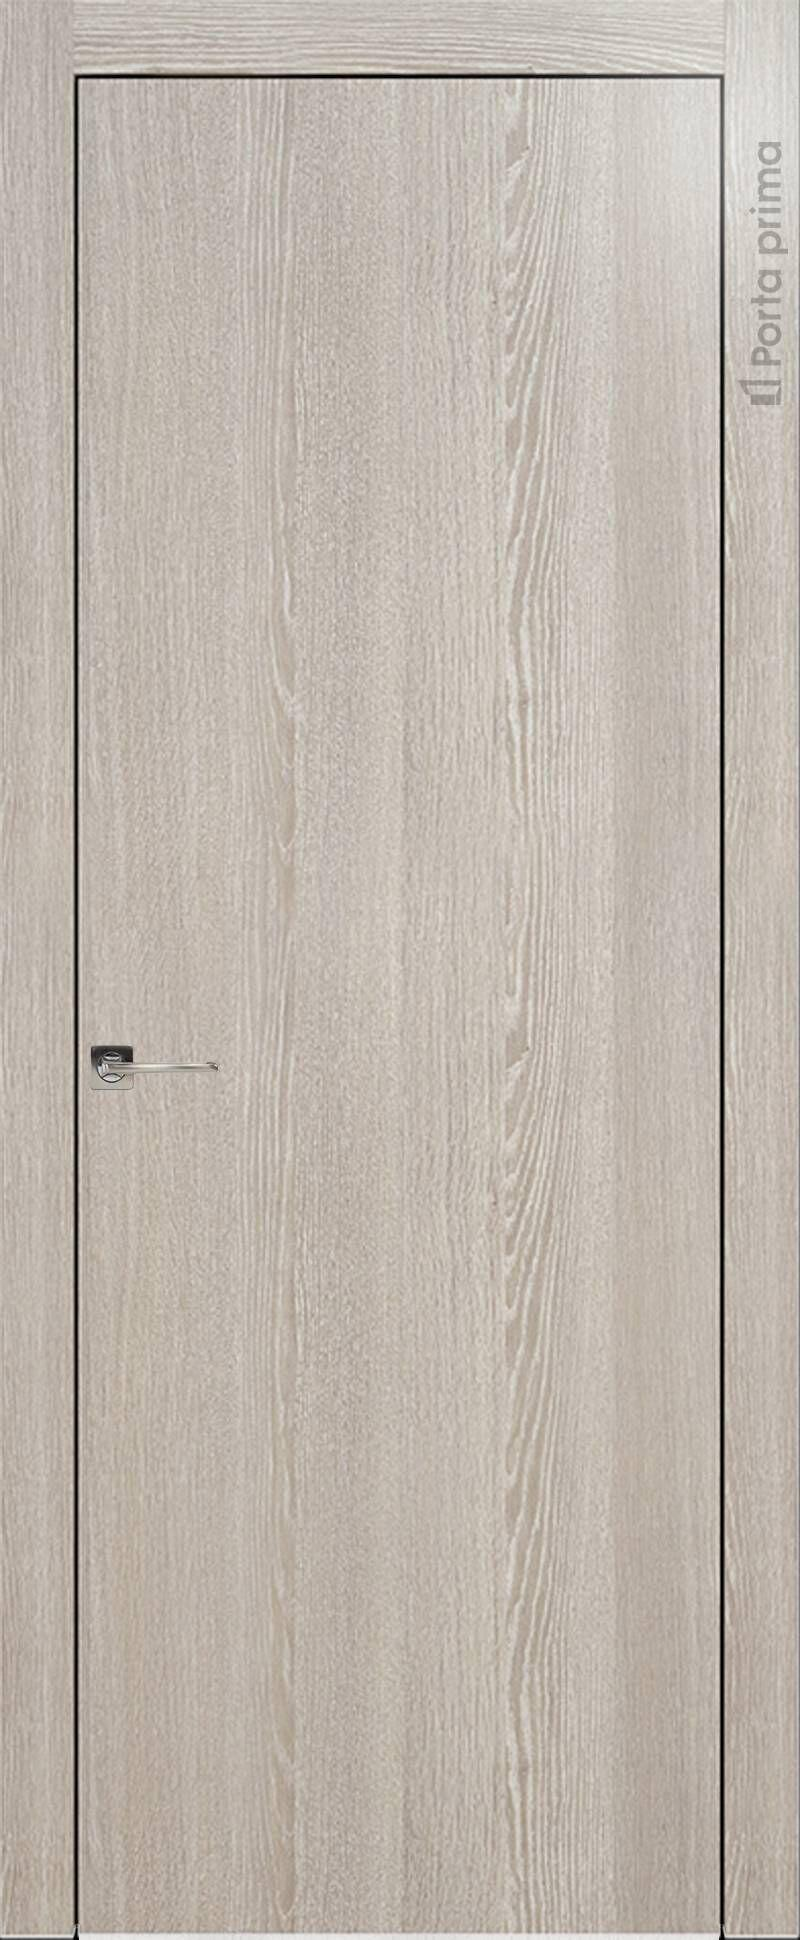 Tivoli А-1 цвет - Серый дуб Без стекла (ДГ)